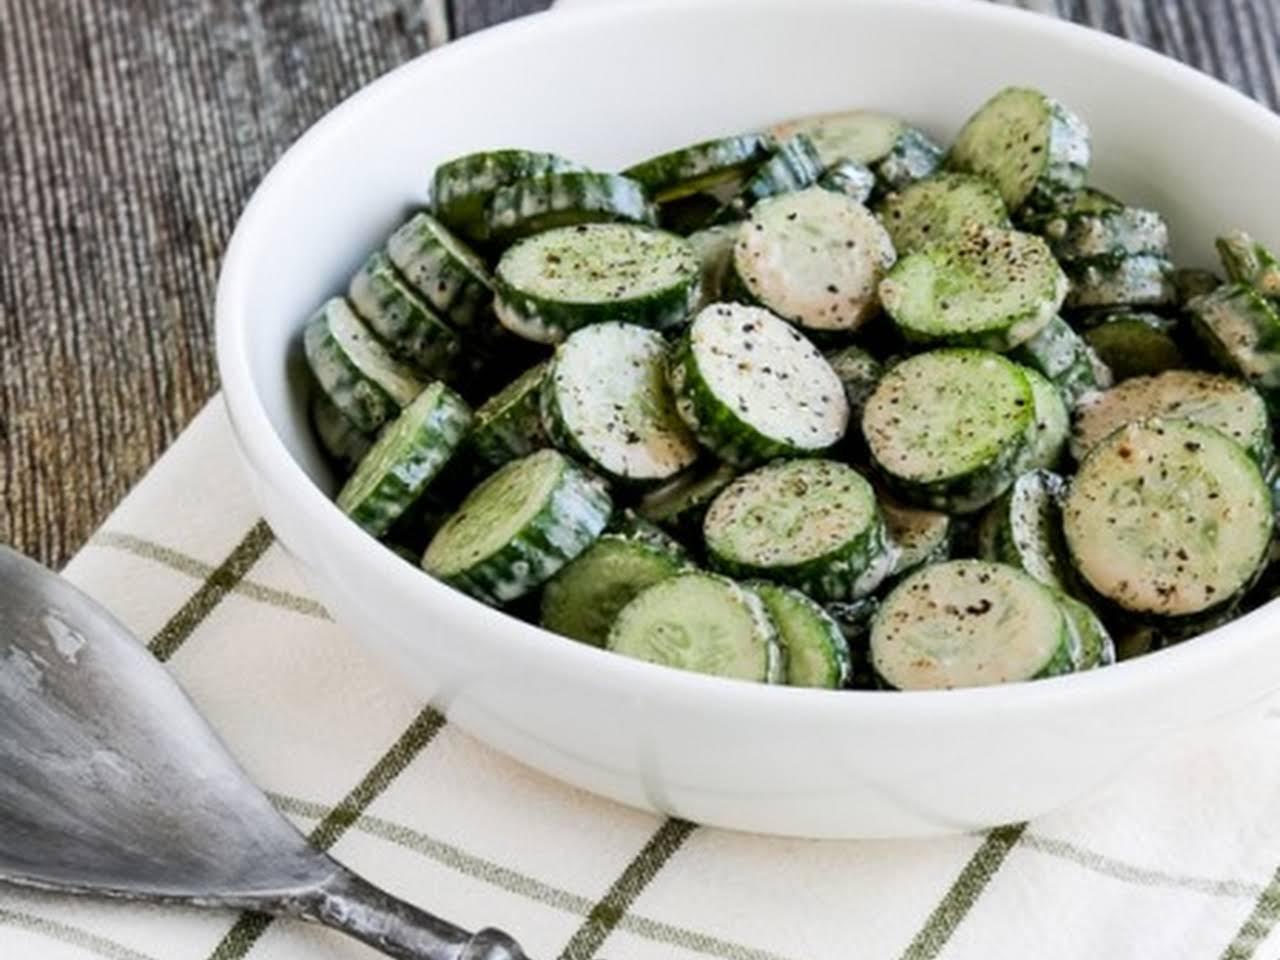 Cucumber Salad Recipe Balsamic Vinegar